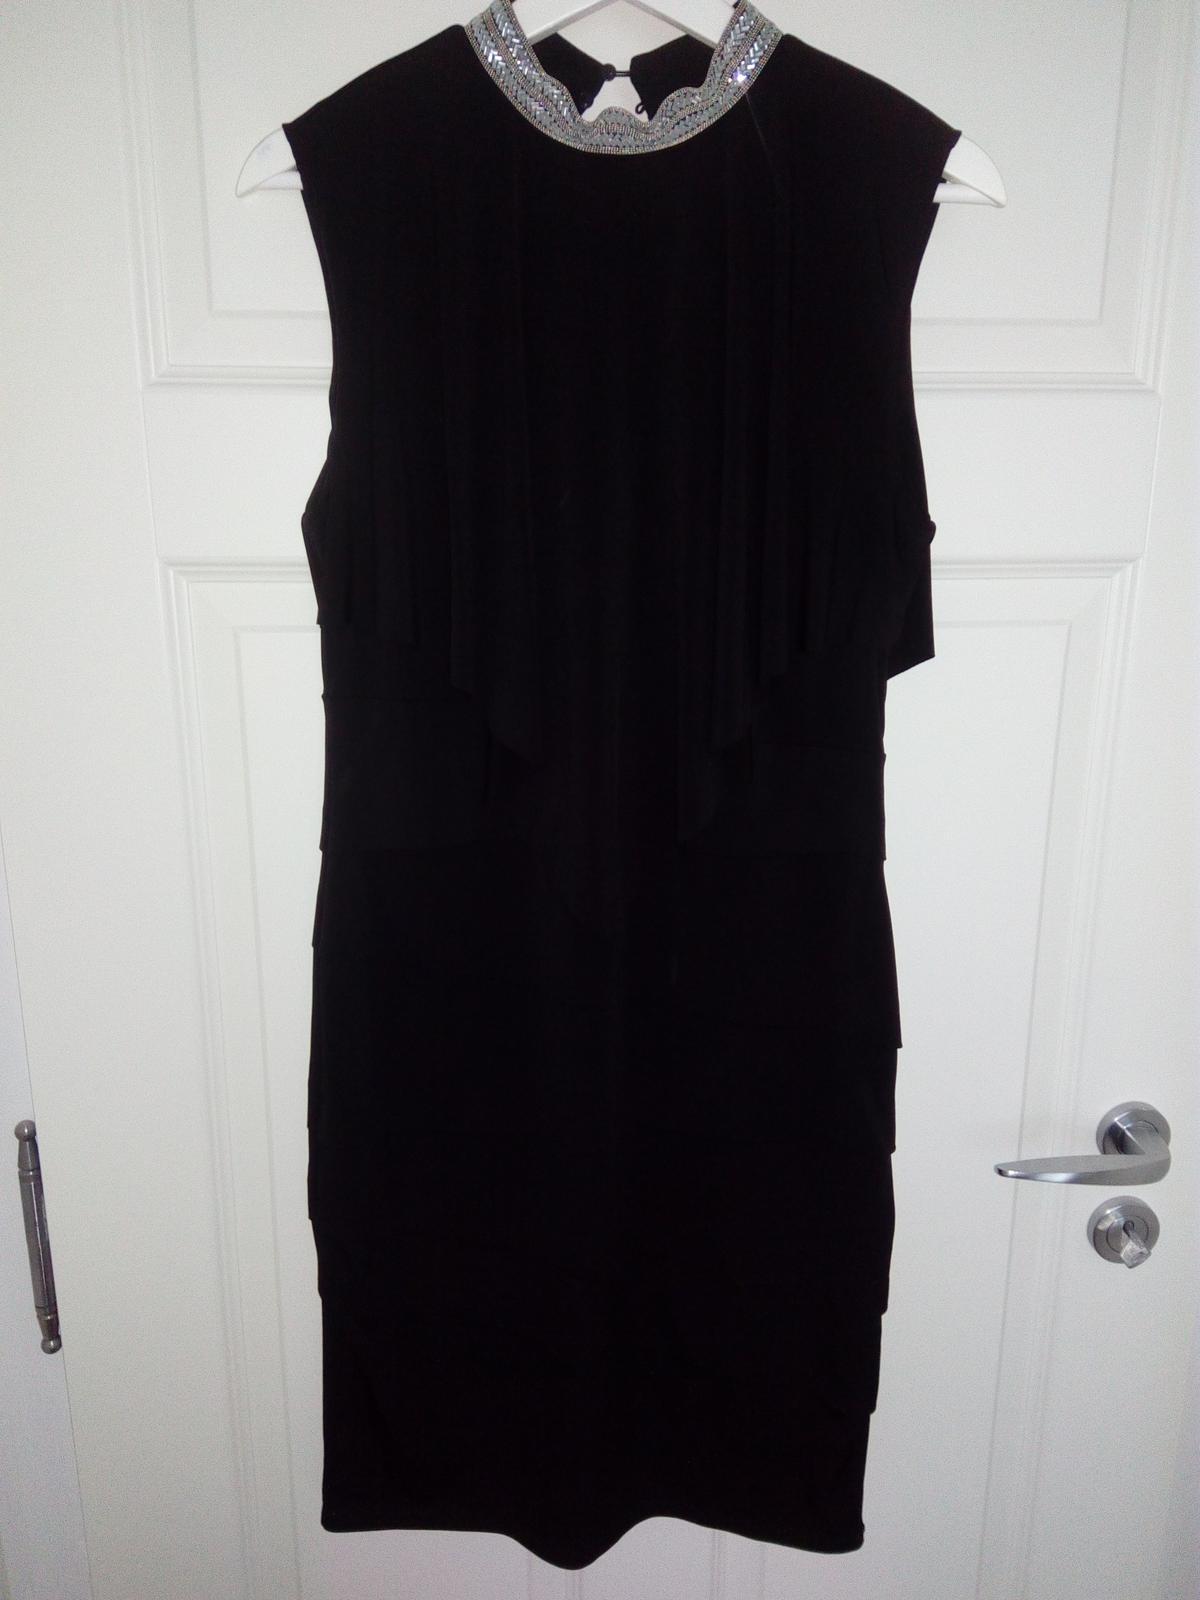 Čierne šaty - Obrázok č. 1